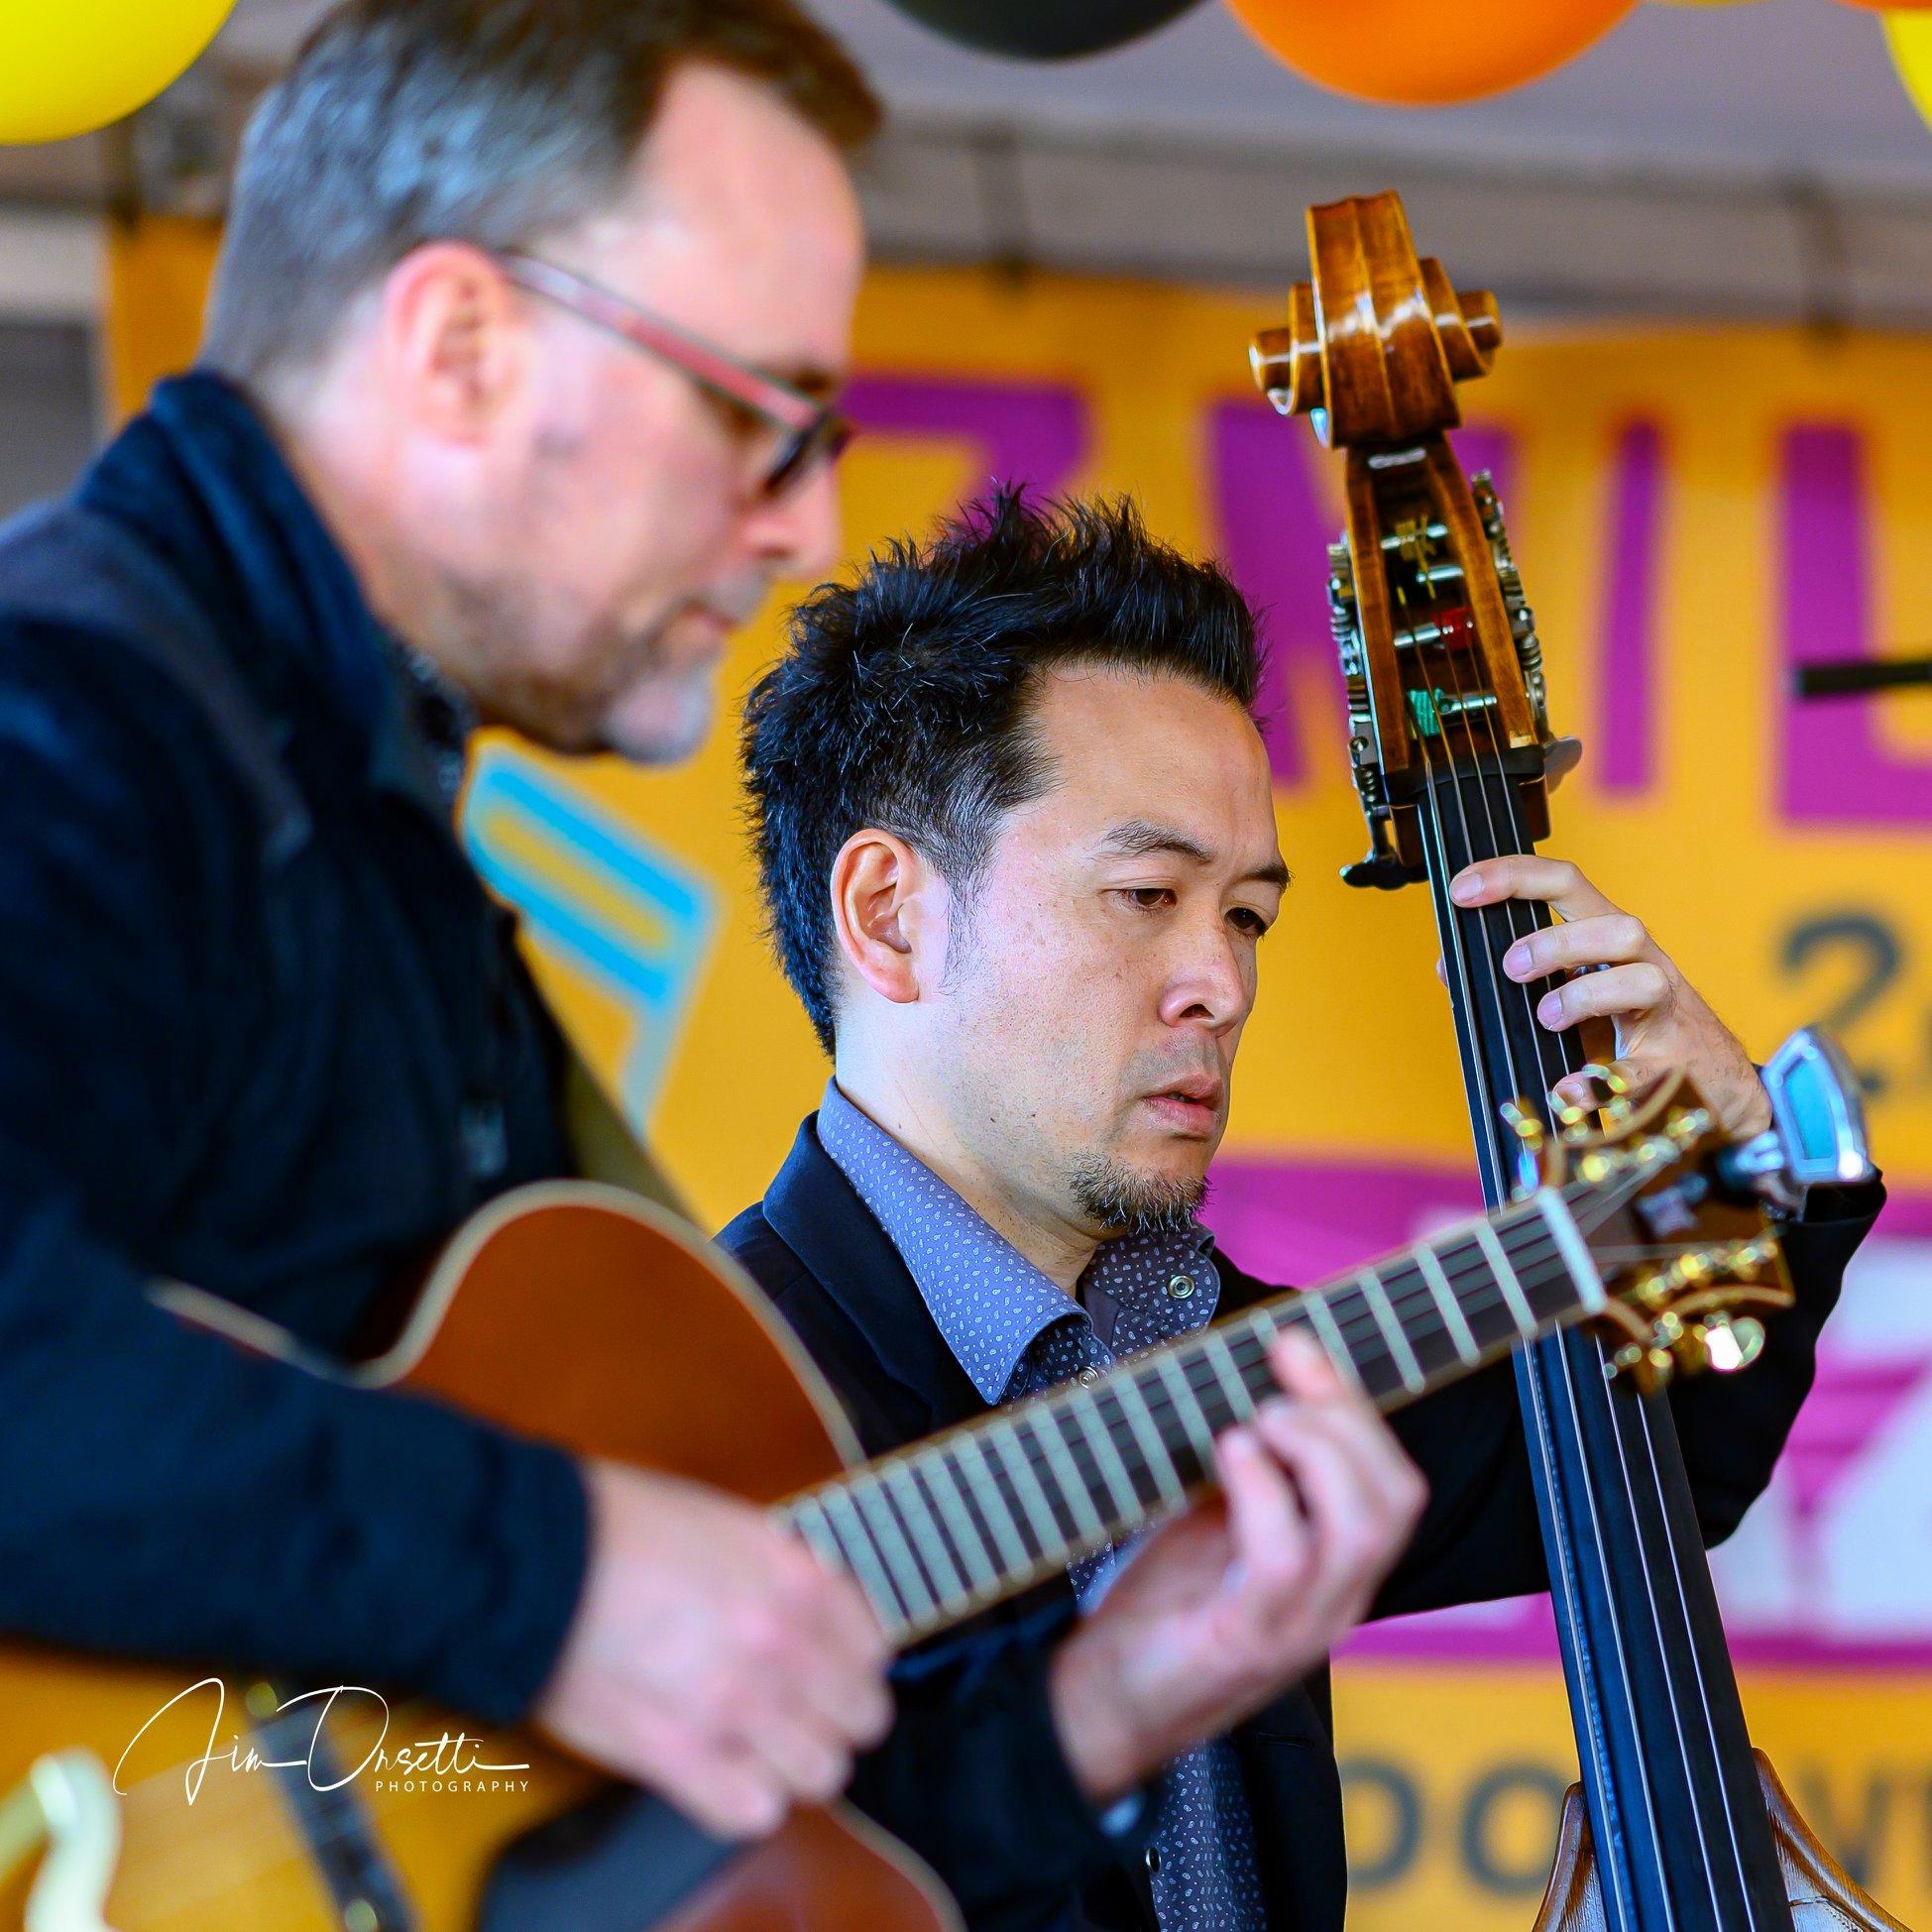 Scott Sorkin & Ken Okada at the 2nd Annual 7 Mile House Jazz Fest 2019